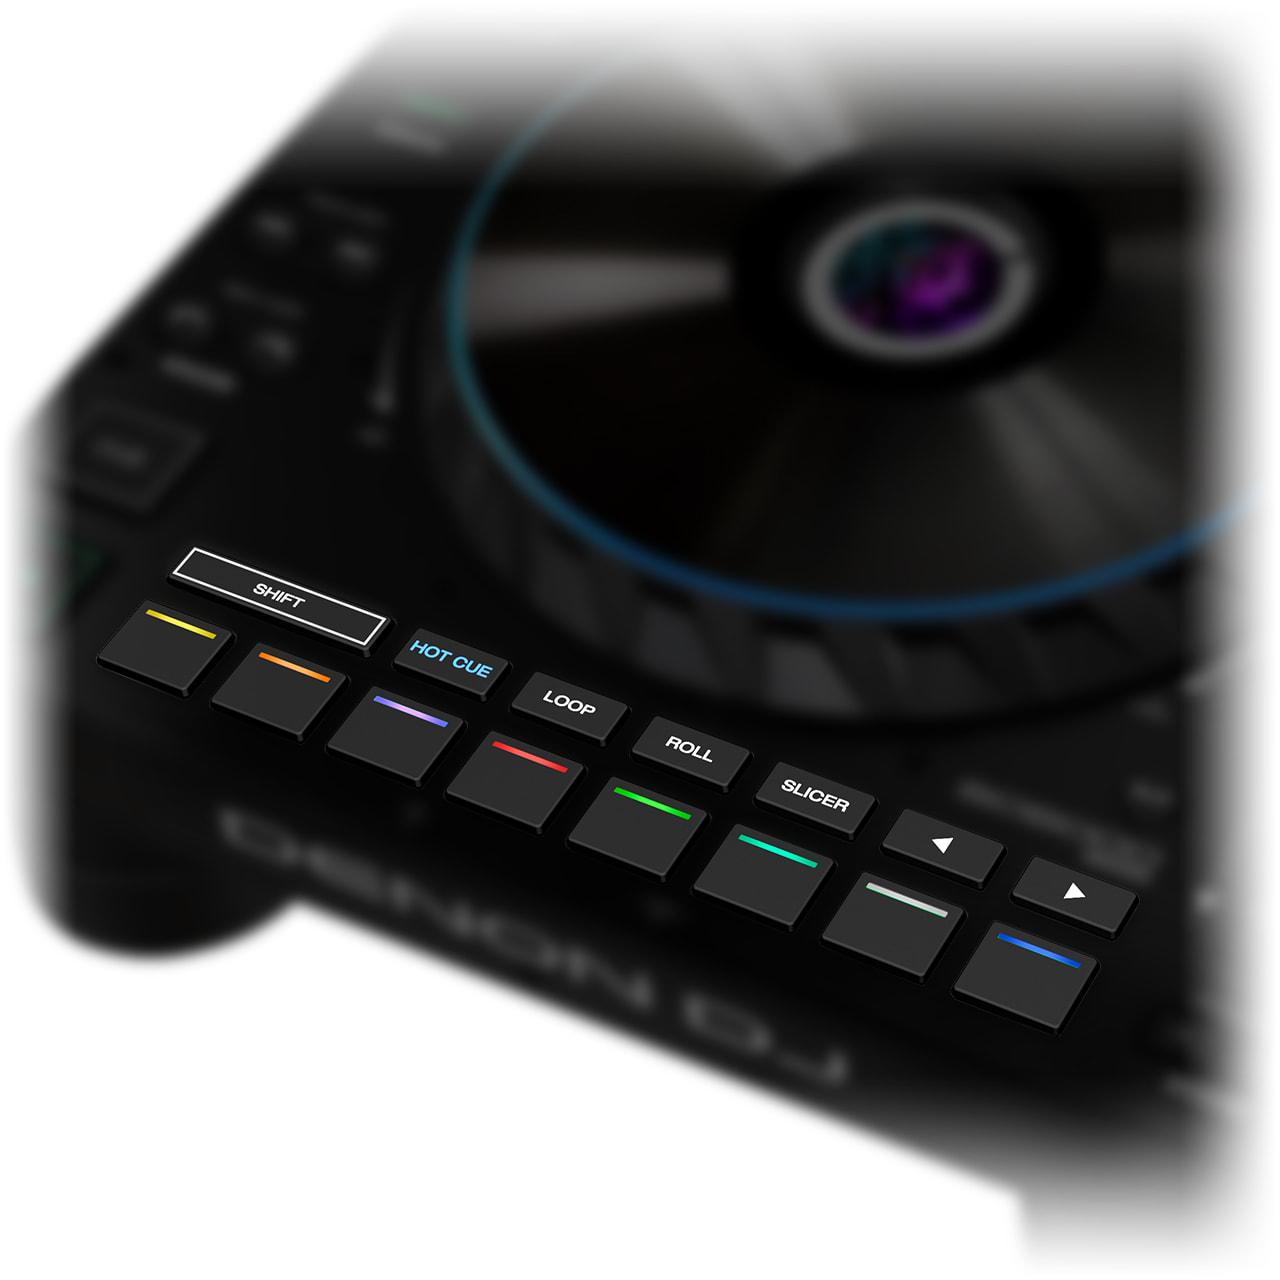 Denon DJ - SC6000 PRIME / Performance Pads mit exzellenter Ansprache